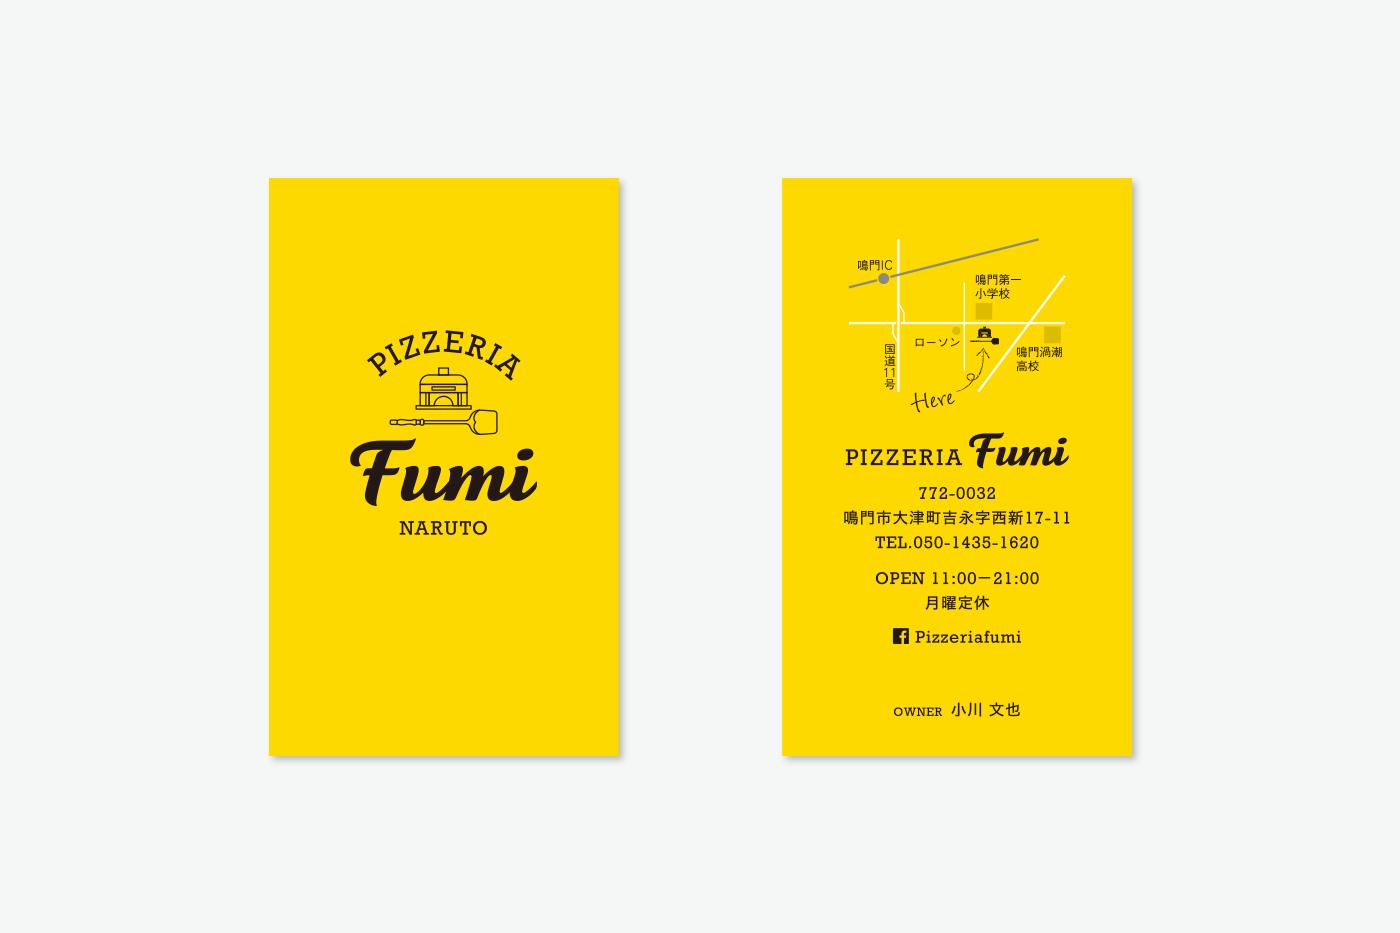 PIZZERIA fumi[飲食店]ショップカードデザイン